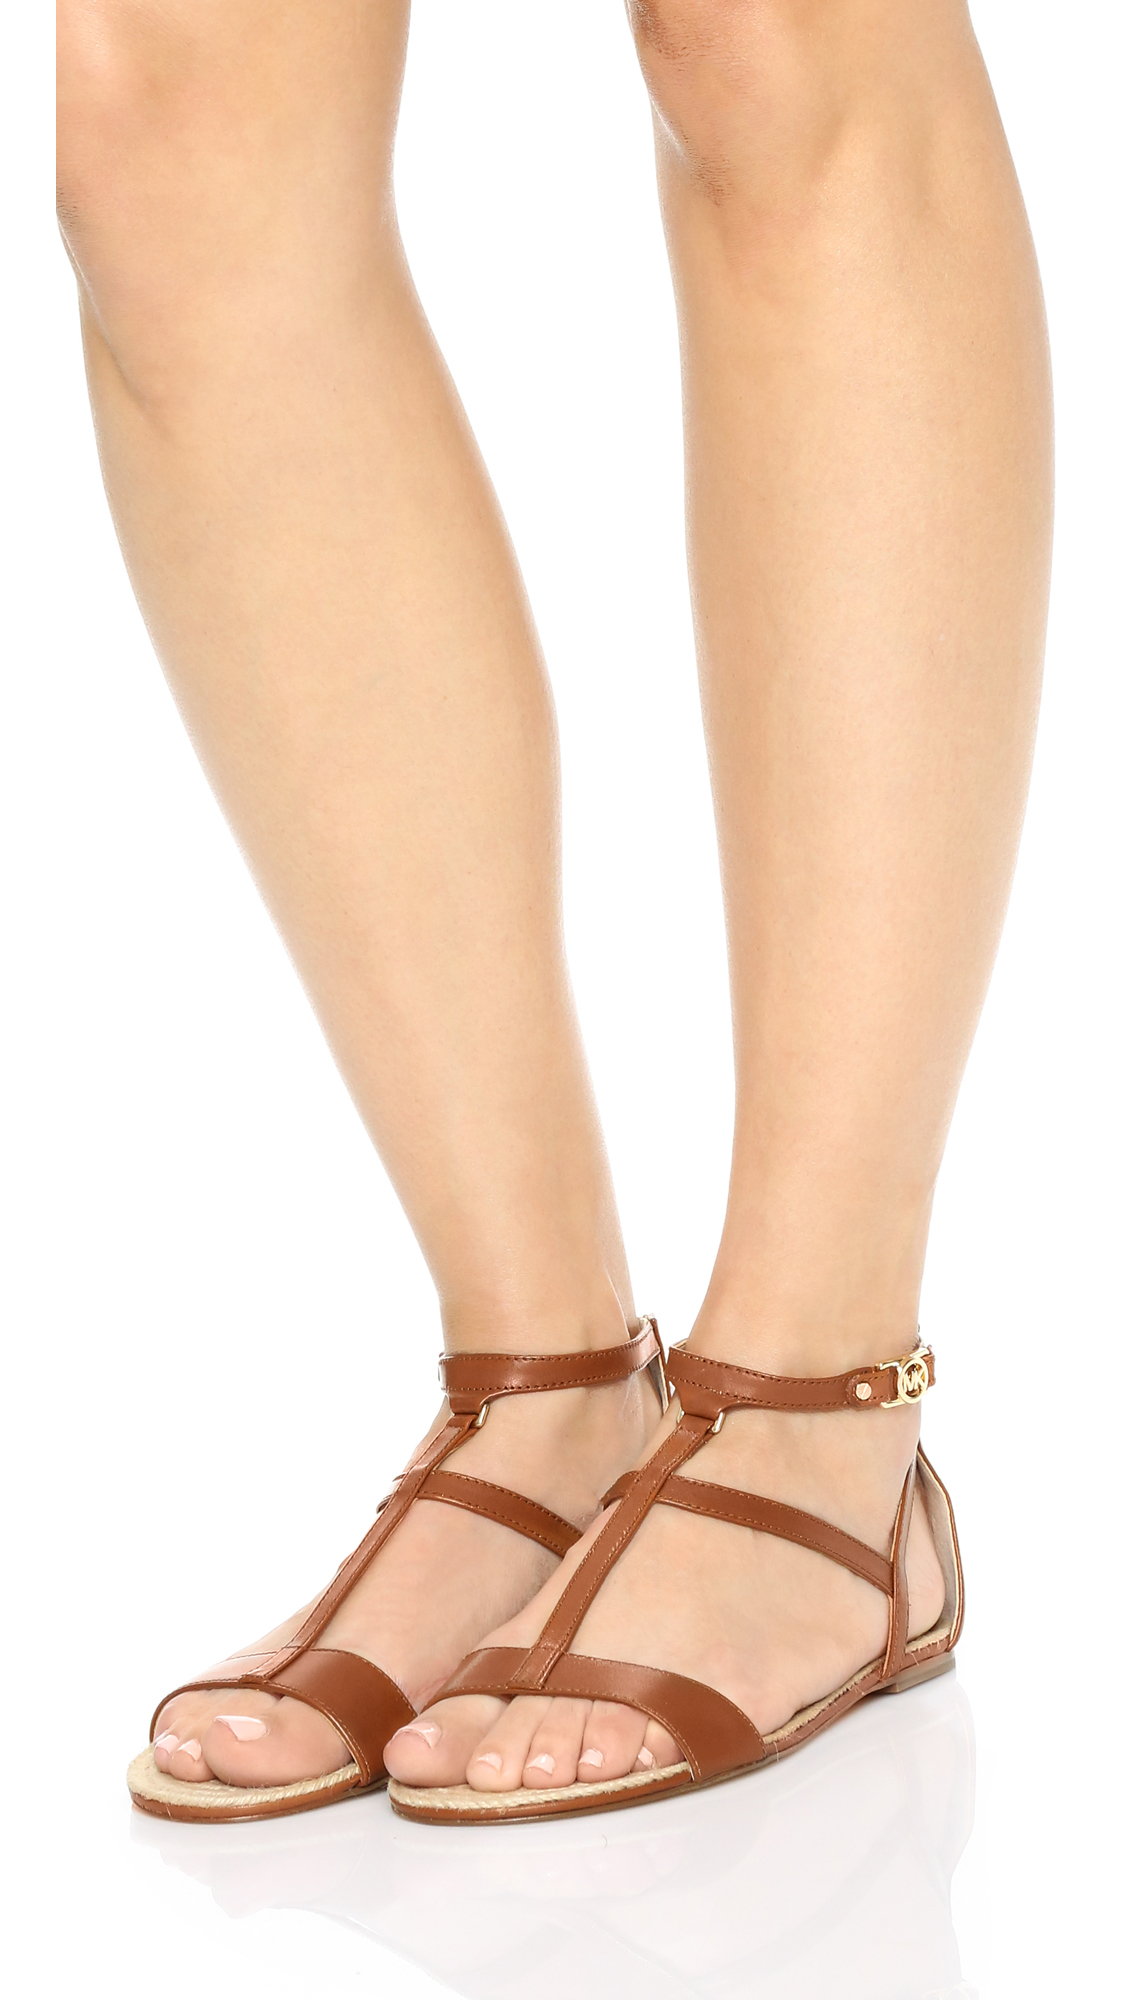 6020d495476 Lyst - MICHAEL Michael Kors Bria Flat Sandals in Brown